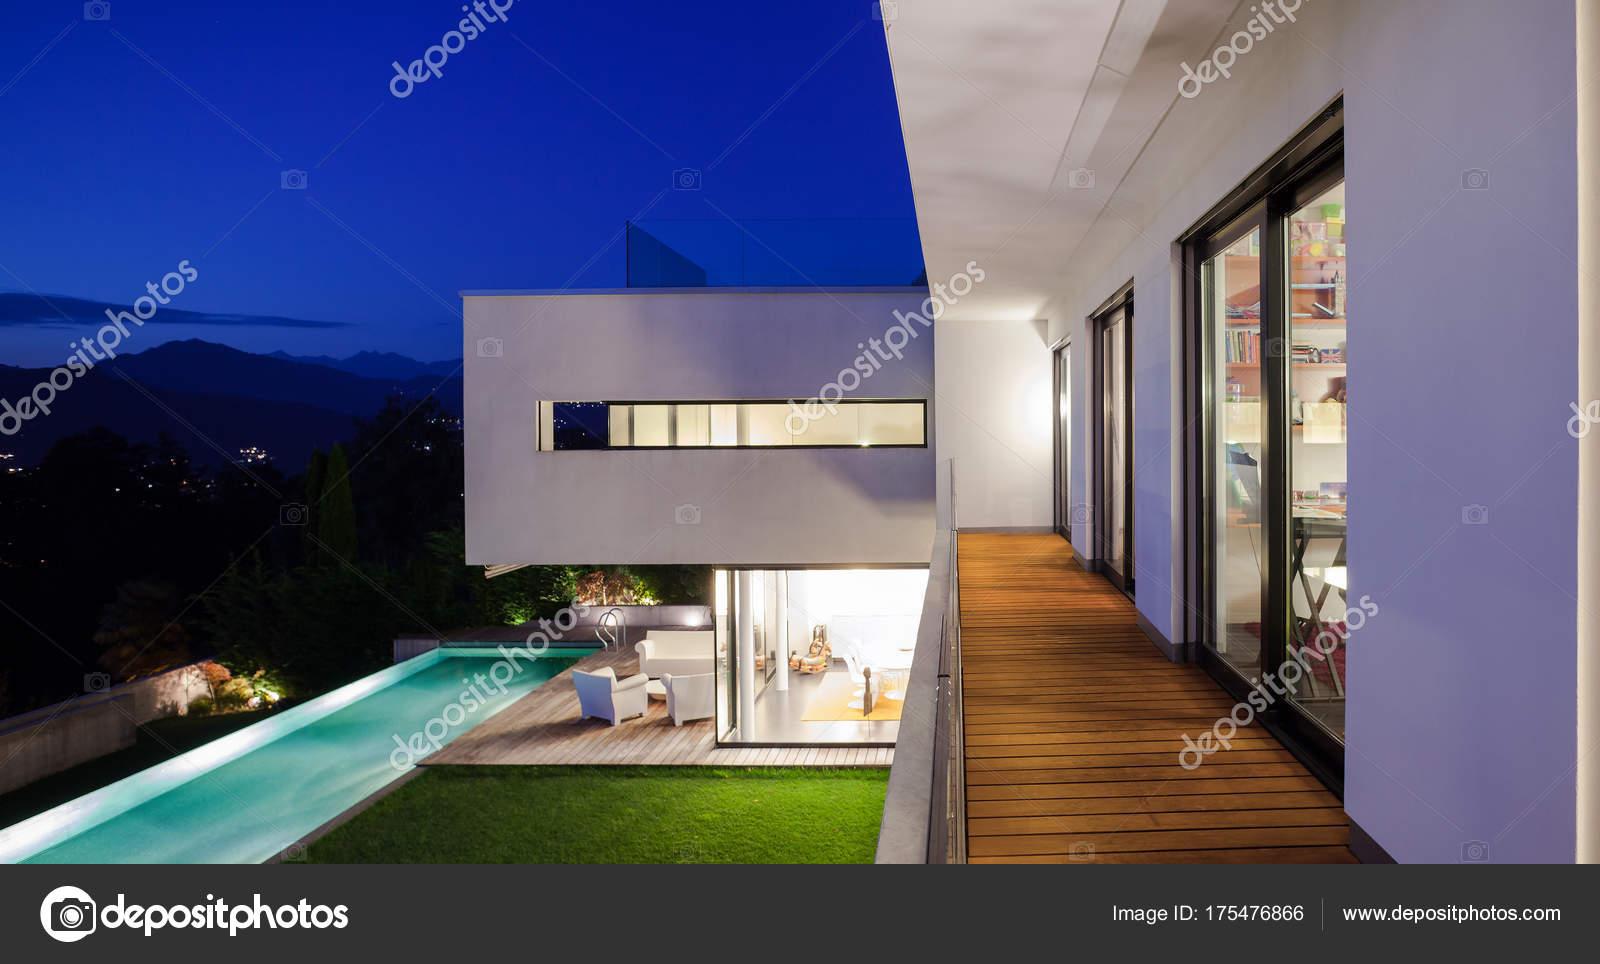 Casa moderna con piscina foto stock zveiger 175476866 for Casa moderna piscina